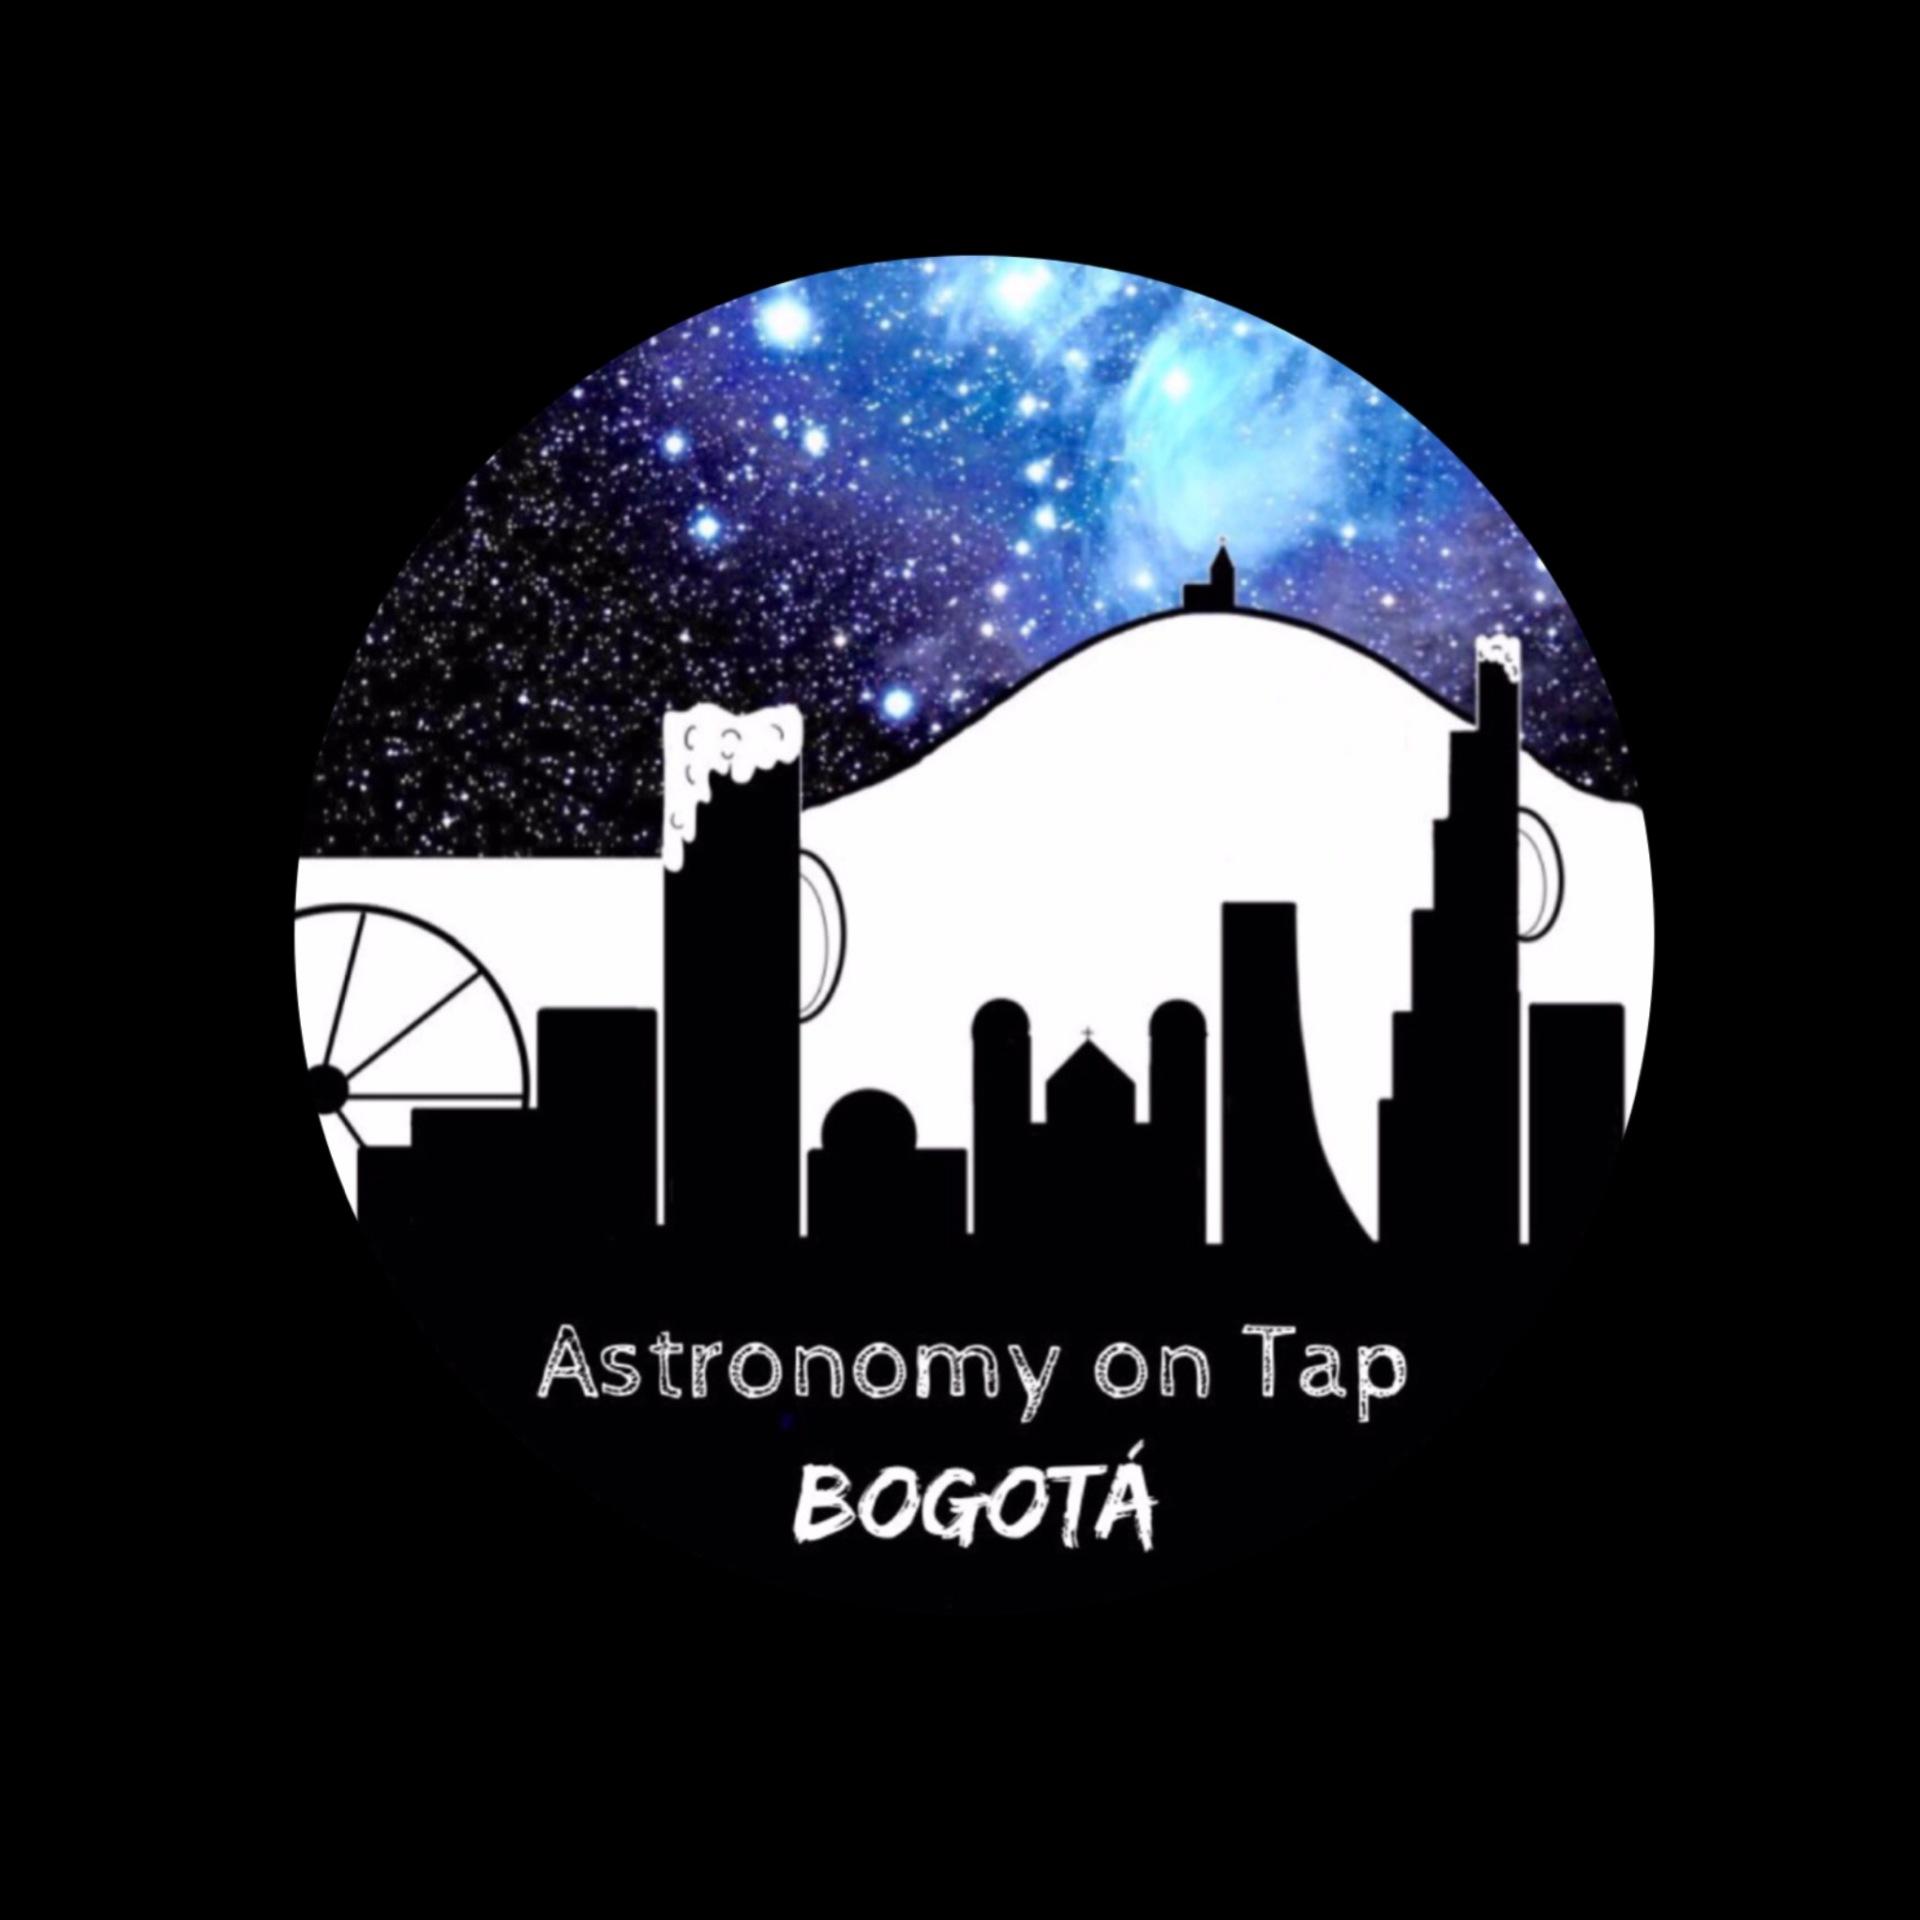 Astronomy on Tap Bogotá (AoT-BOG)